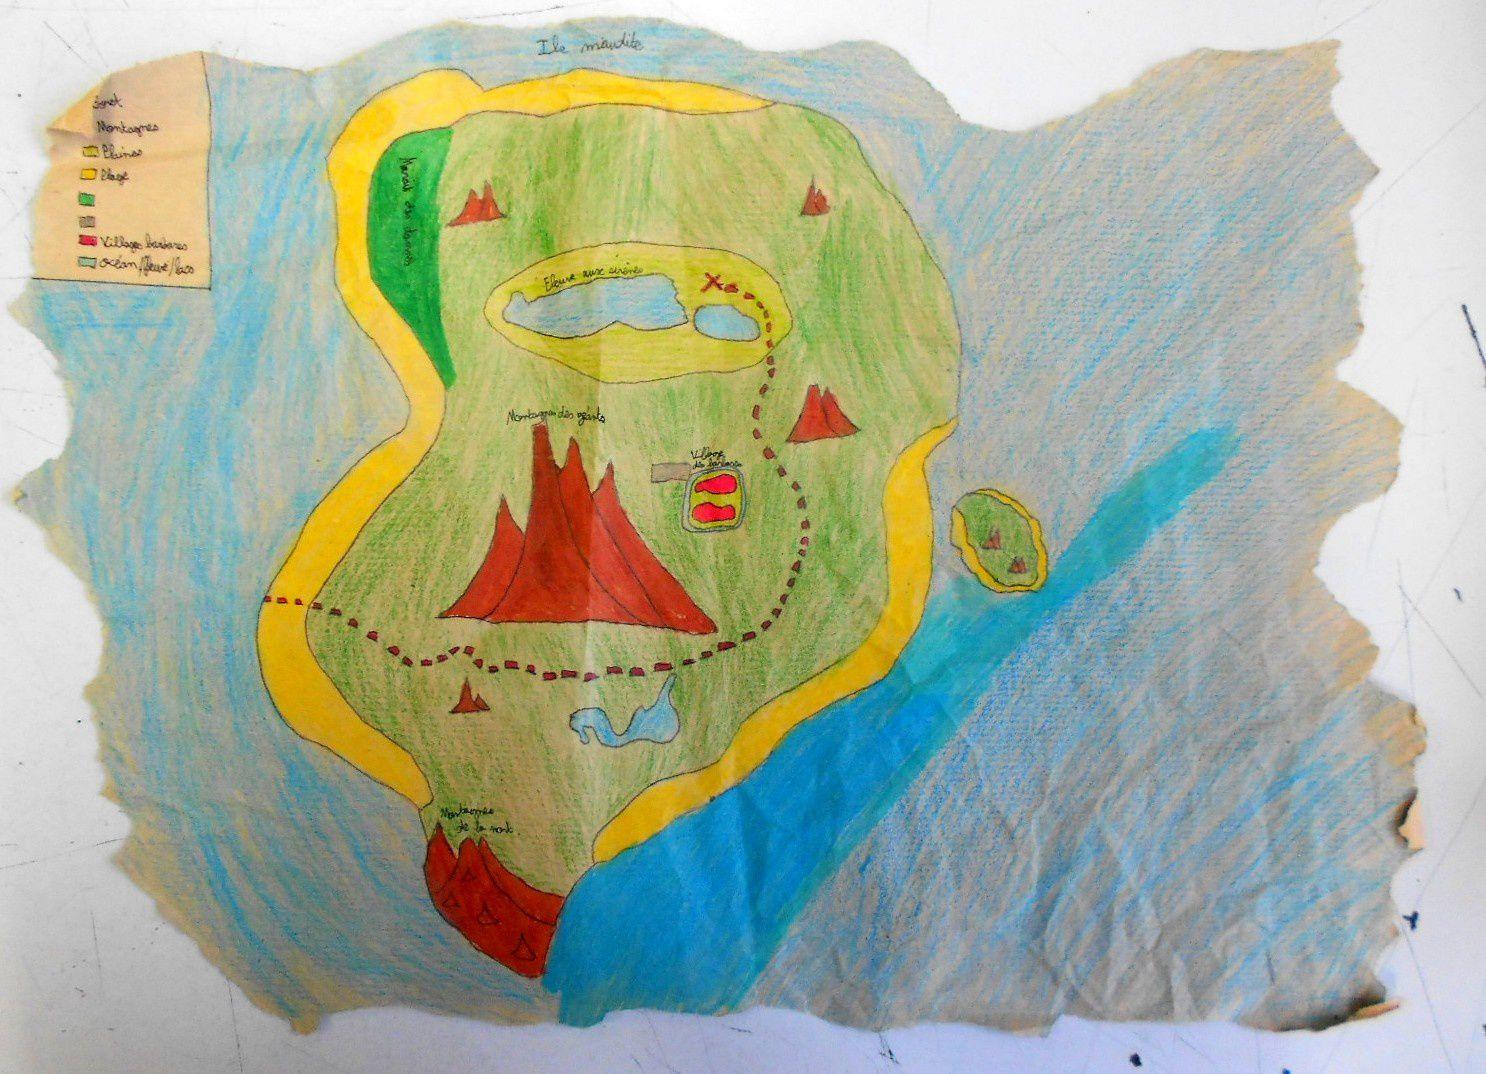 La carte de l'ïle au trésor - 5°